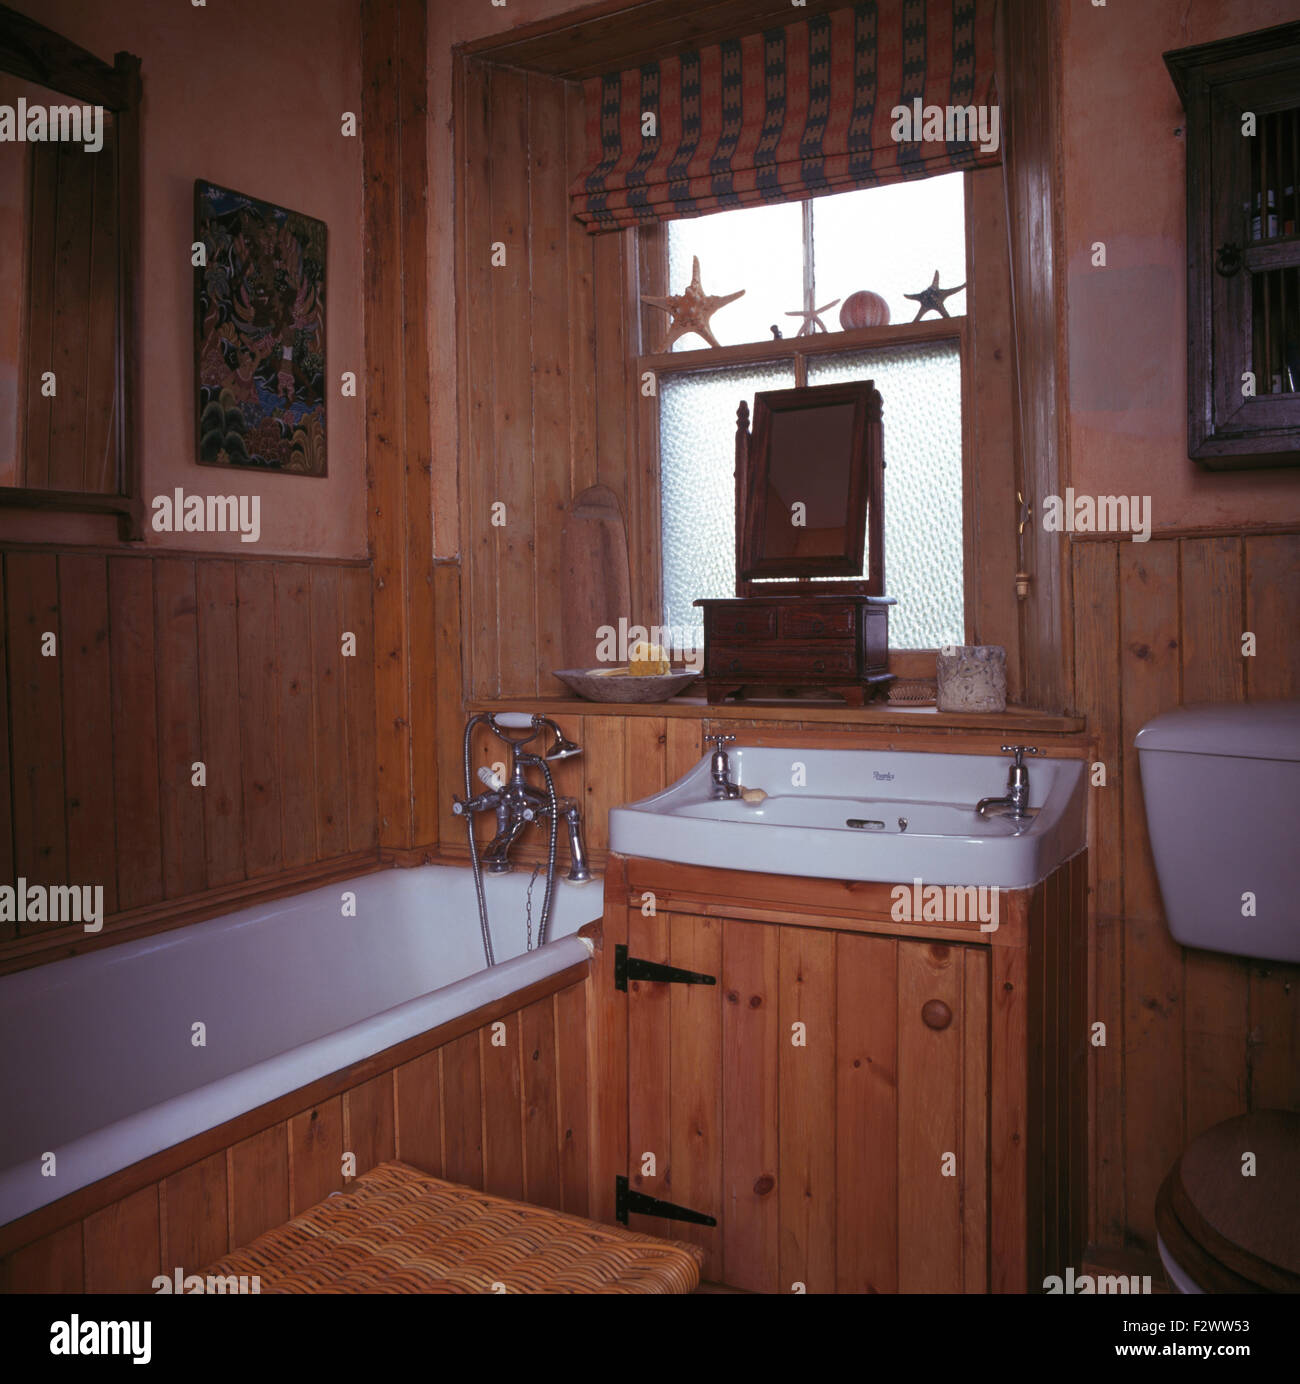 Pine Bathroom Vanity Unit: Blind On Frosted Window Above Basin In Pine Vanity Unit In